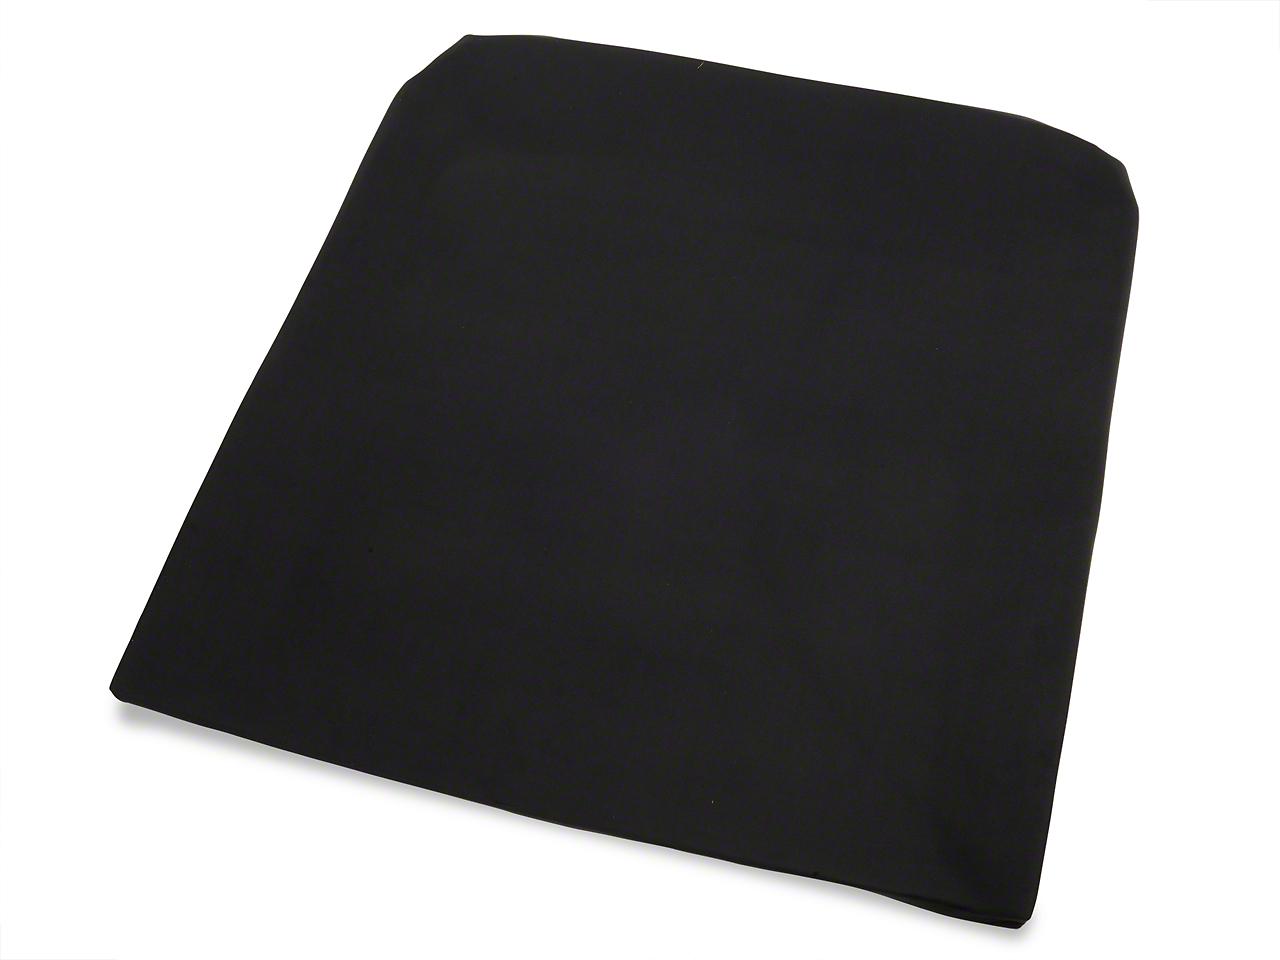 TMI Black Cloth Headliner w/ Sunroof (79-93 Hatchback)